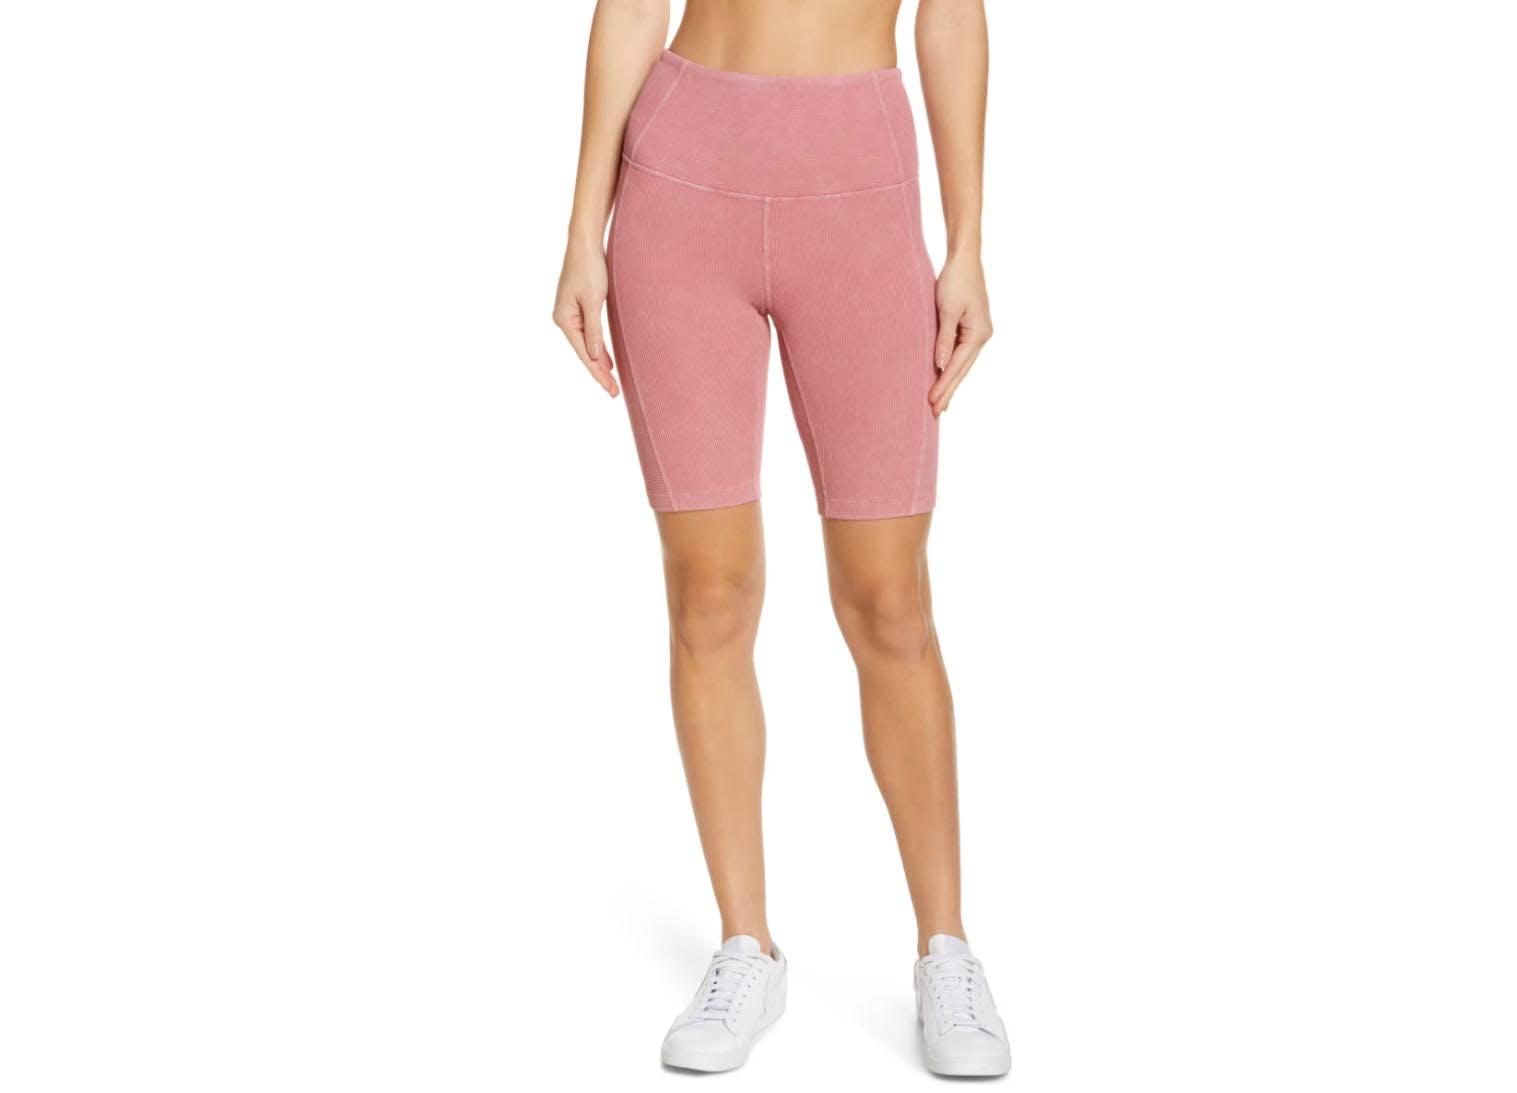 nordstrom sale fitness zella shorts